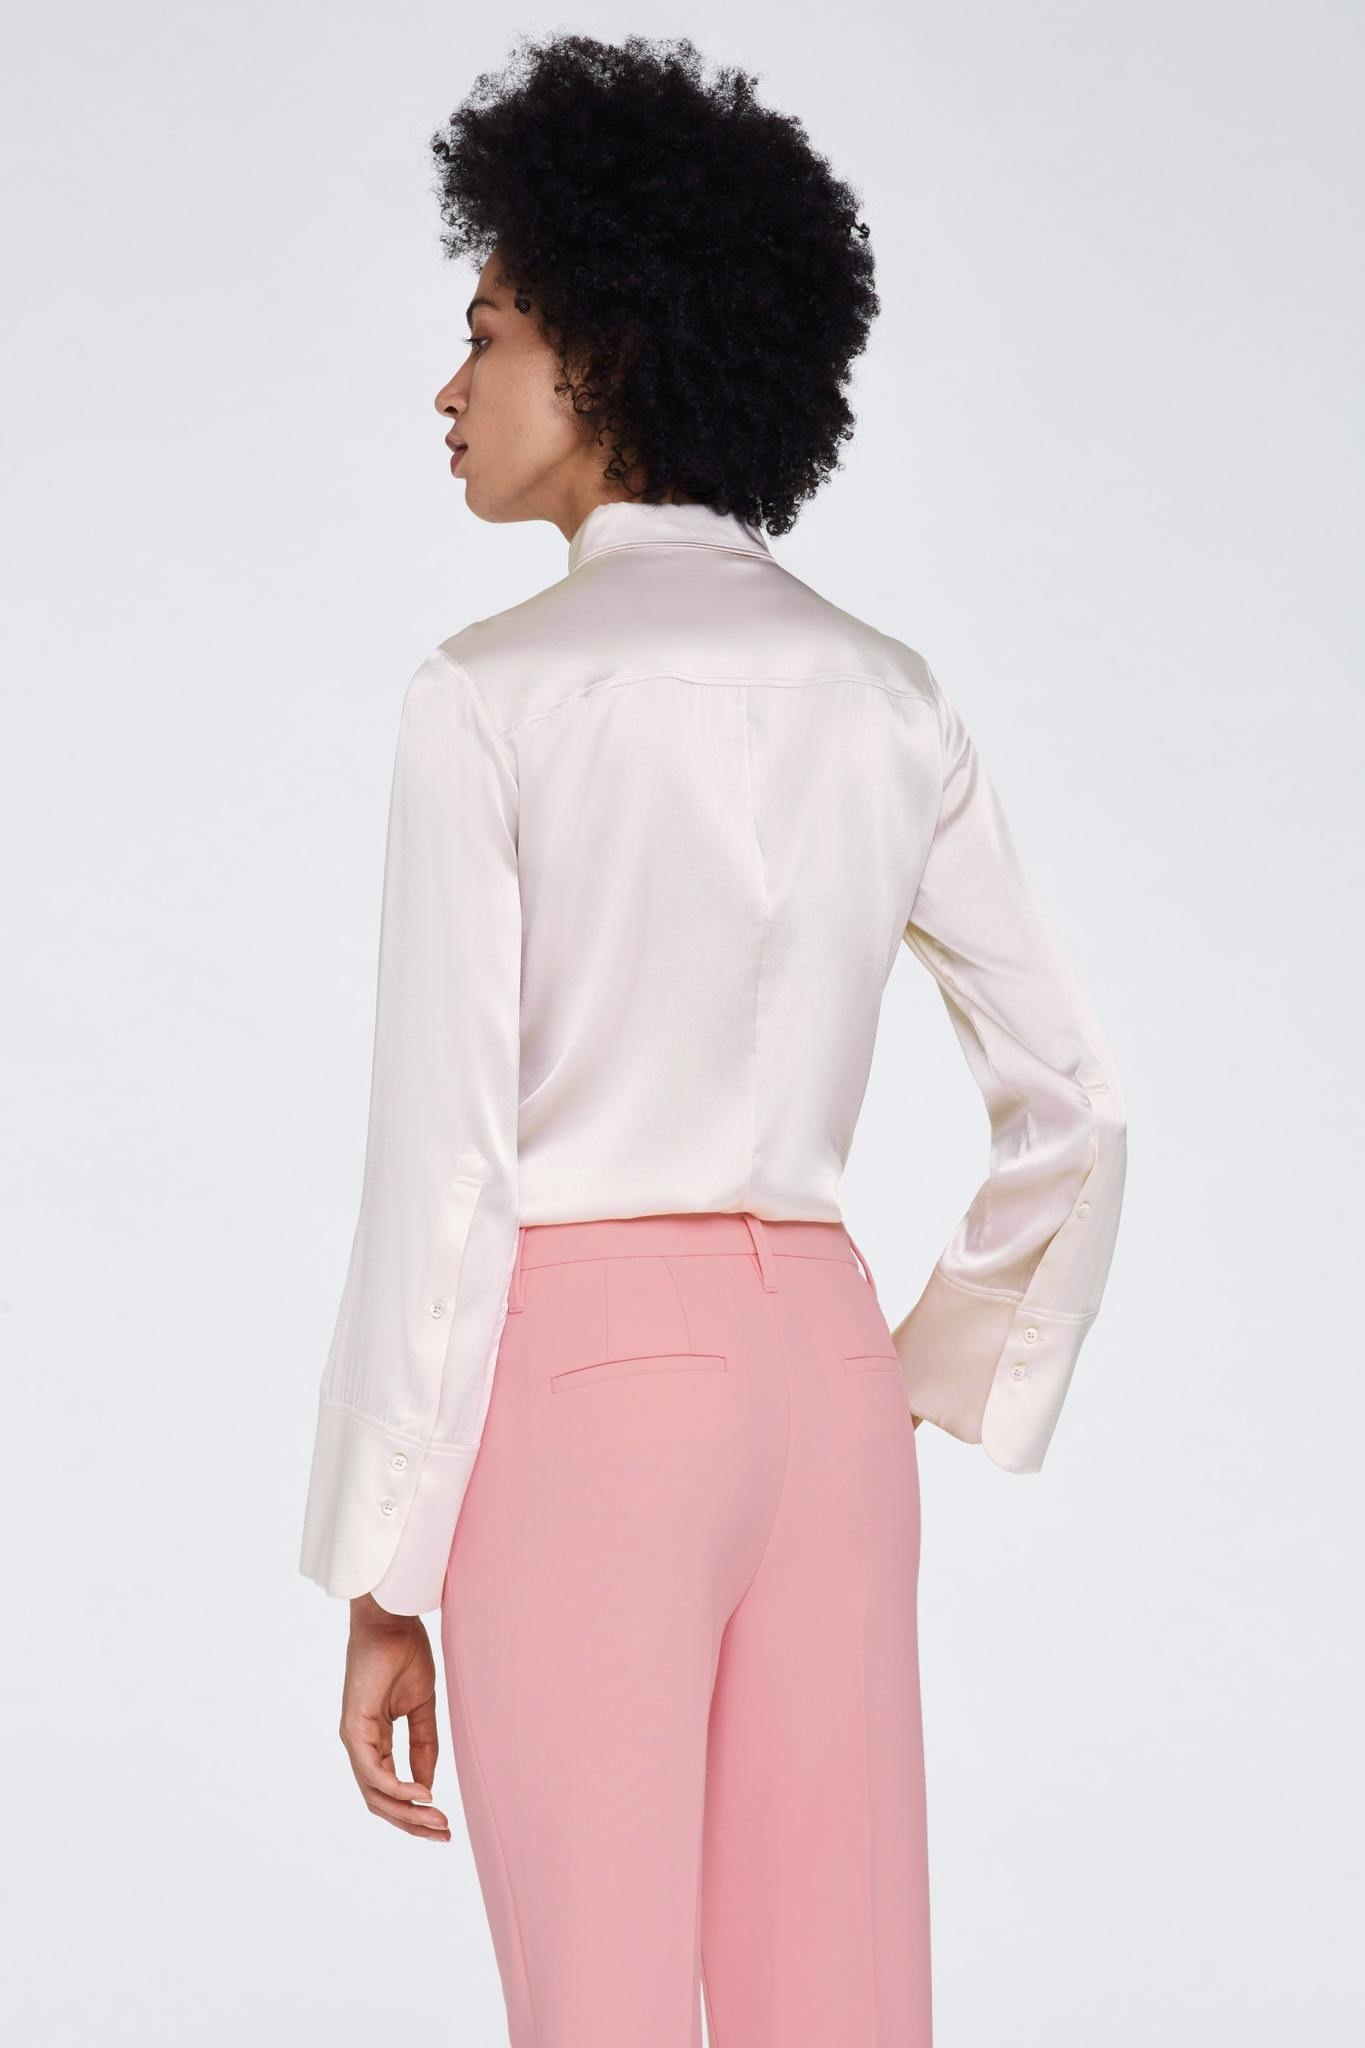 Sense of Shine blouse Dorothee Schumacher-2